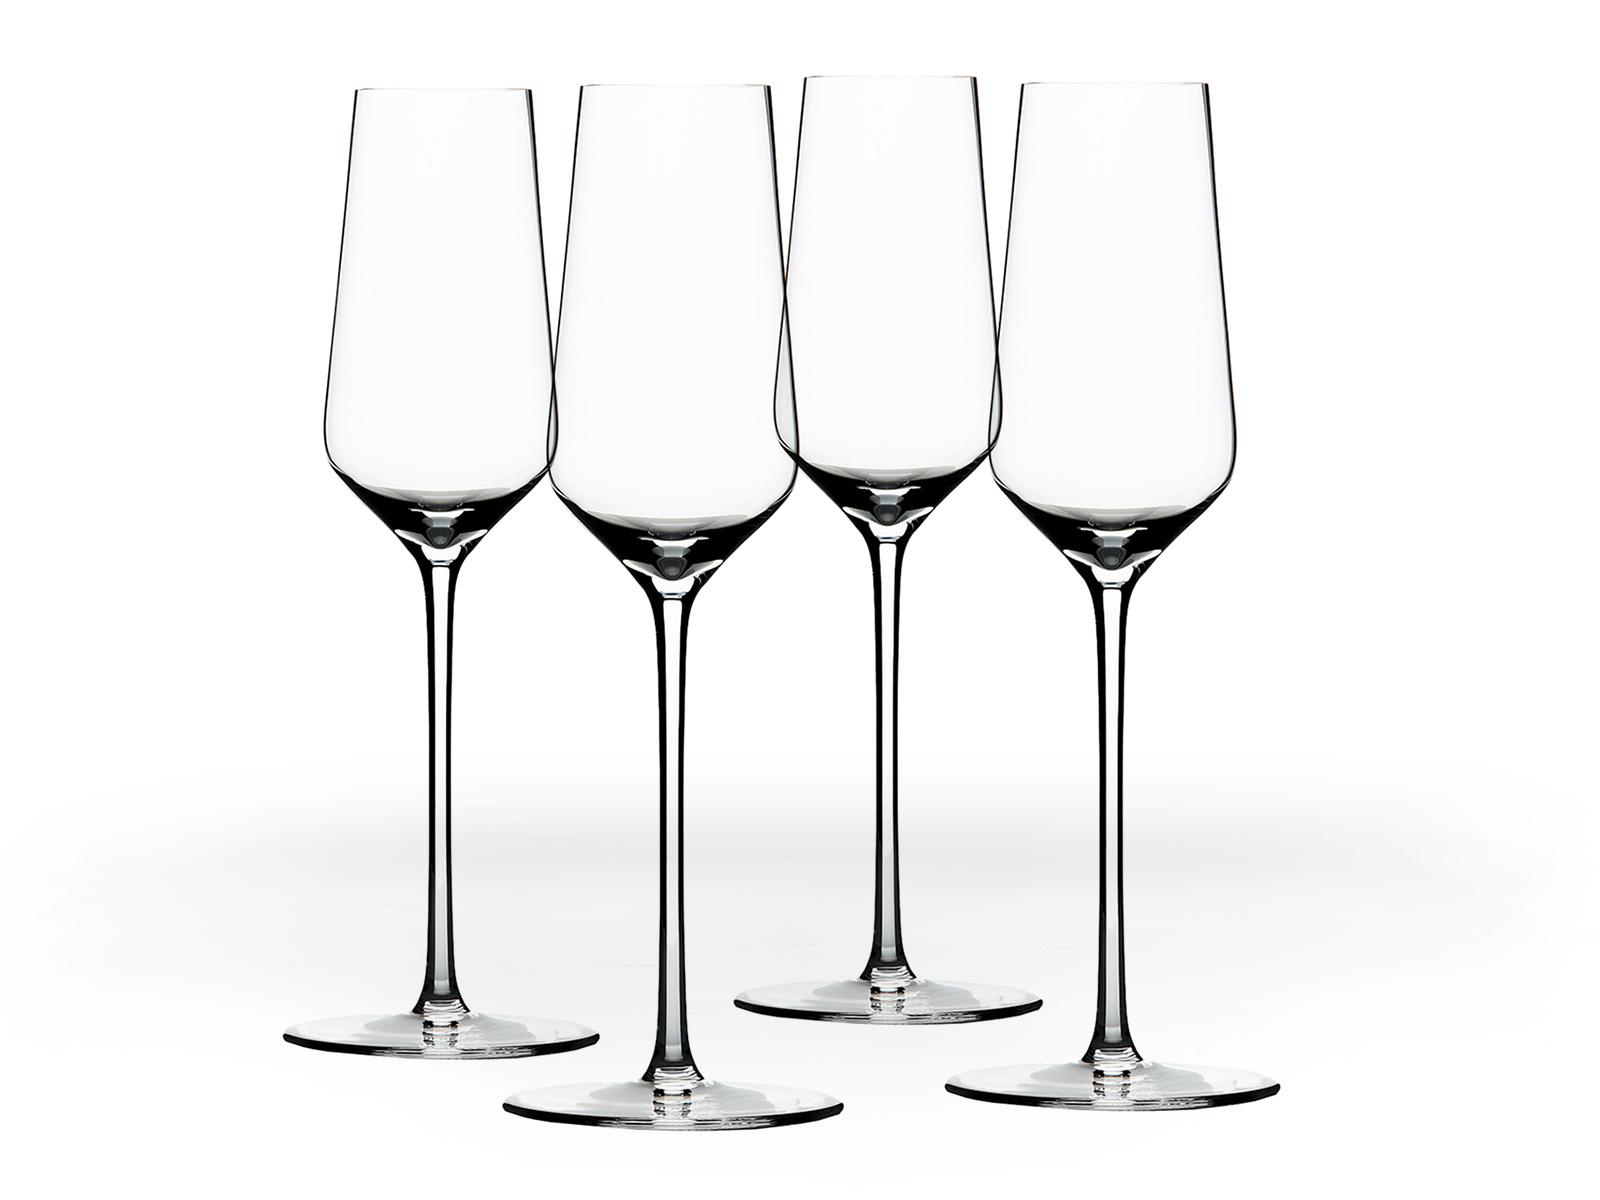 Zalto-Wine-Monger-Digestive-Glass-4-1600x1200_sku_cropped_1600x1200_q95_a9eda6